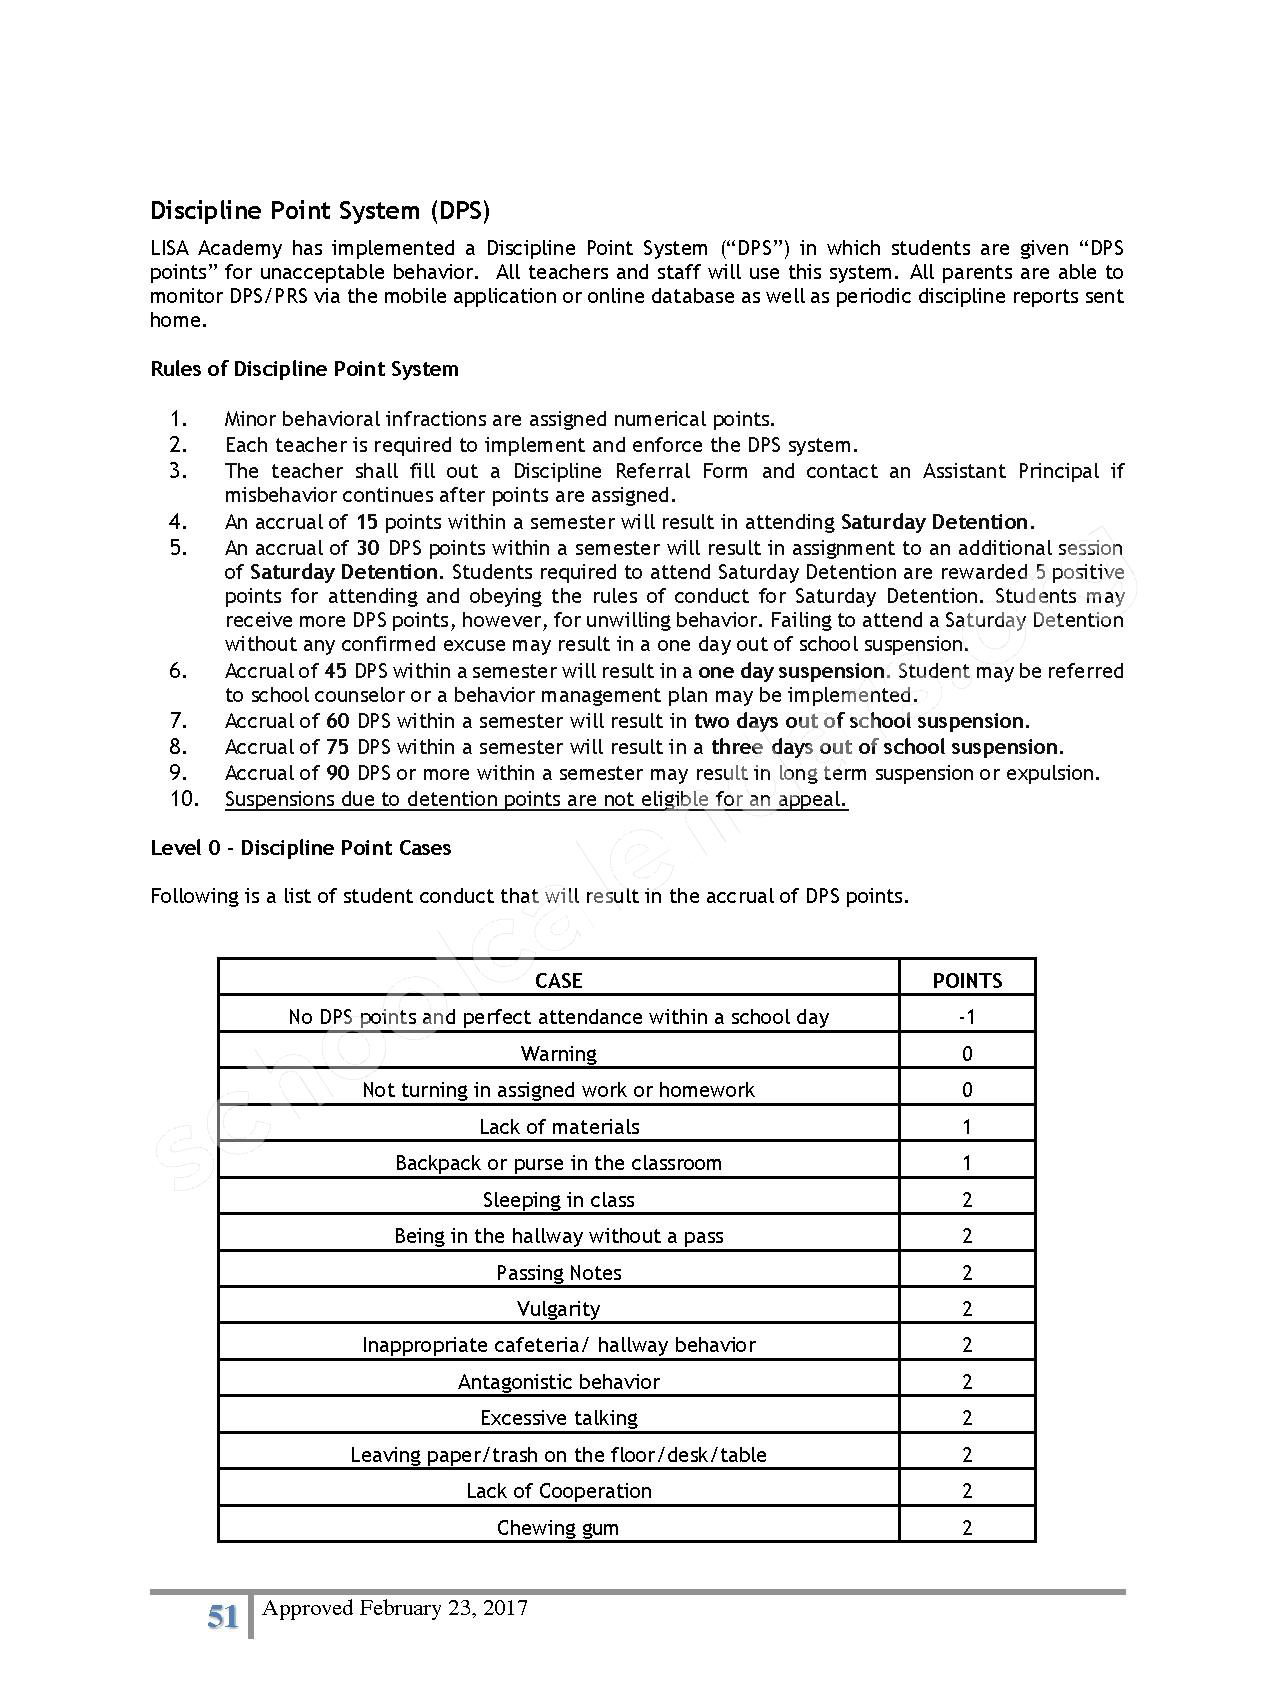 2016 - 2017 District Calendar – Lisa Academy Public Charter Schools – page 51